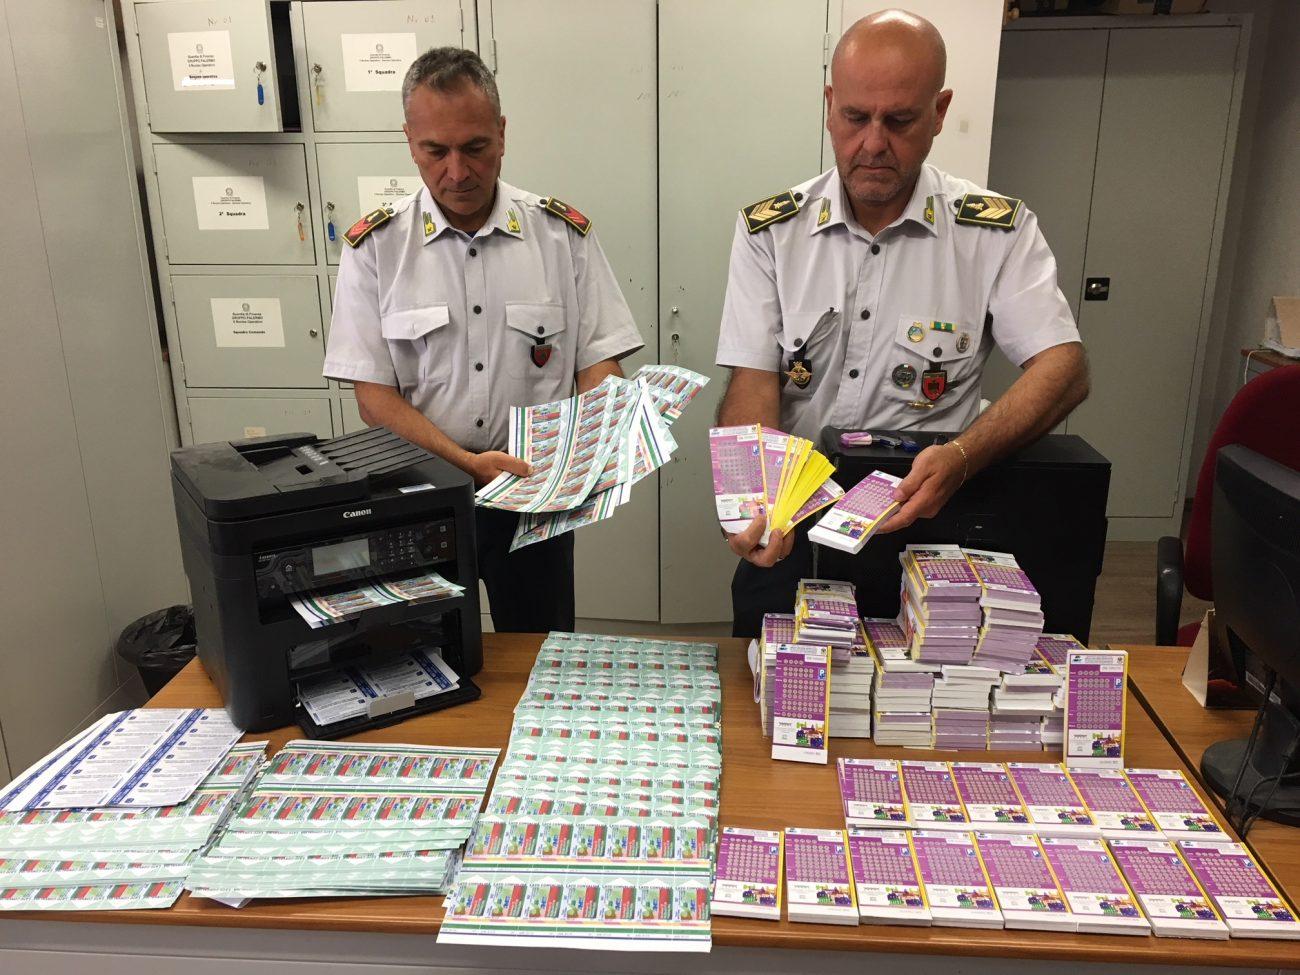 Scoperta tipografia dei biglietti falsi Amat, un arresto a Bagheria